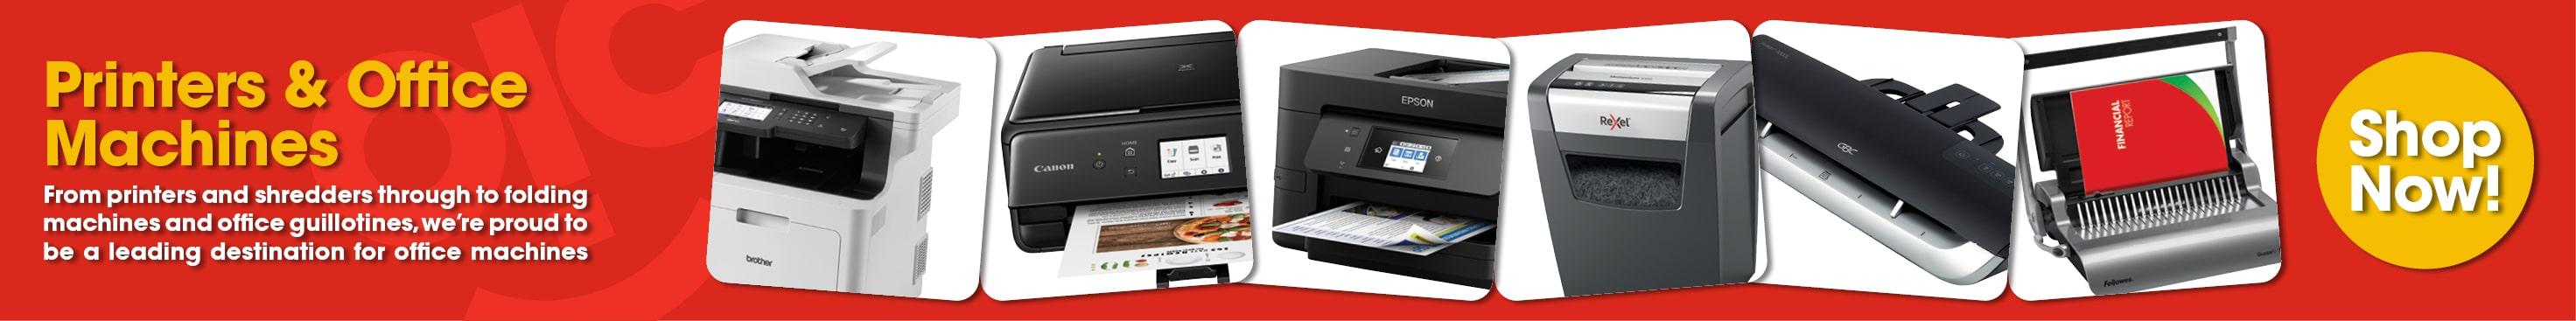 Printers & Office Machines